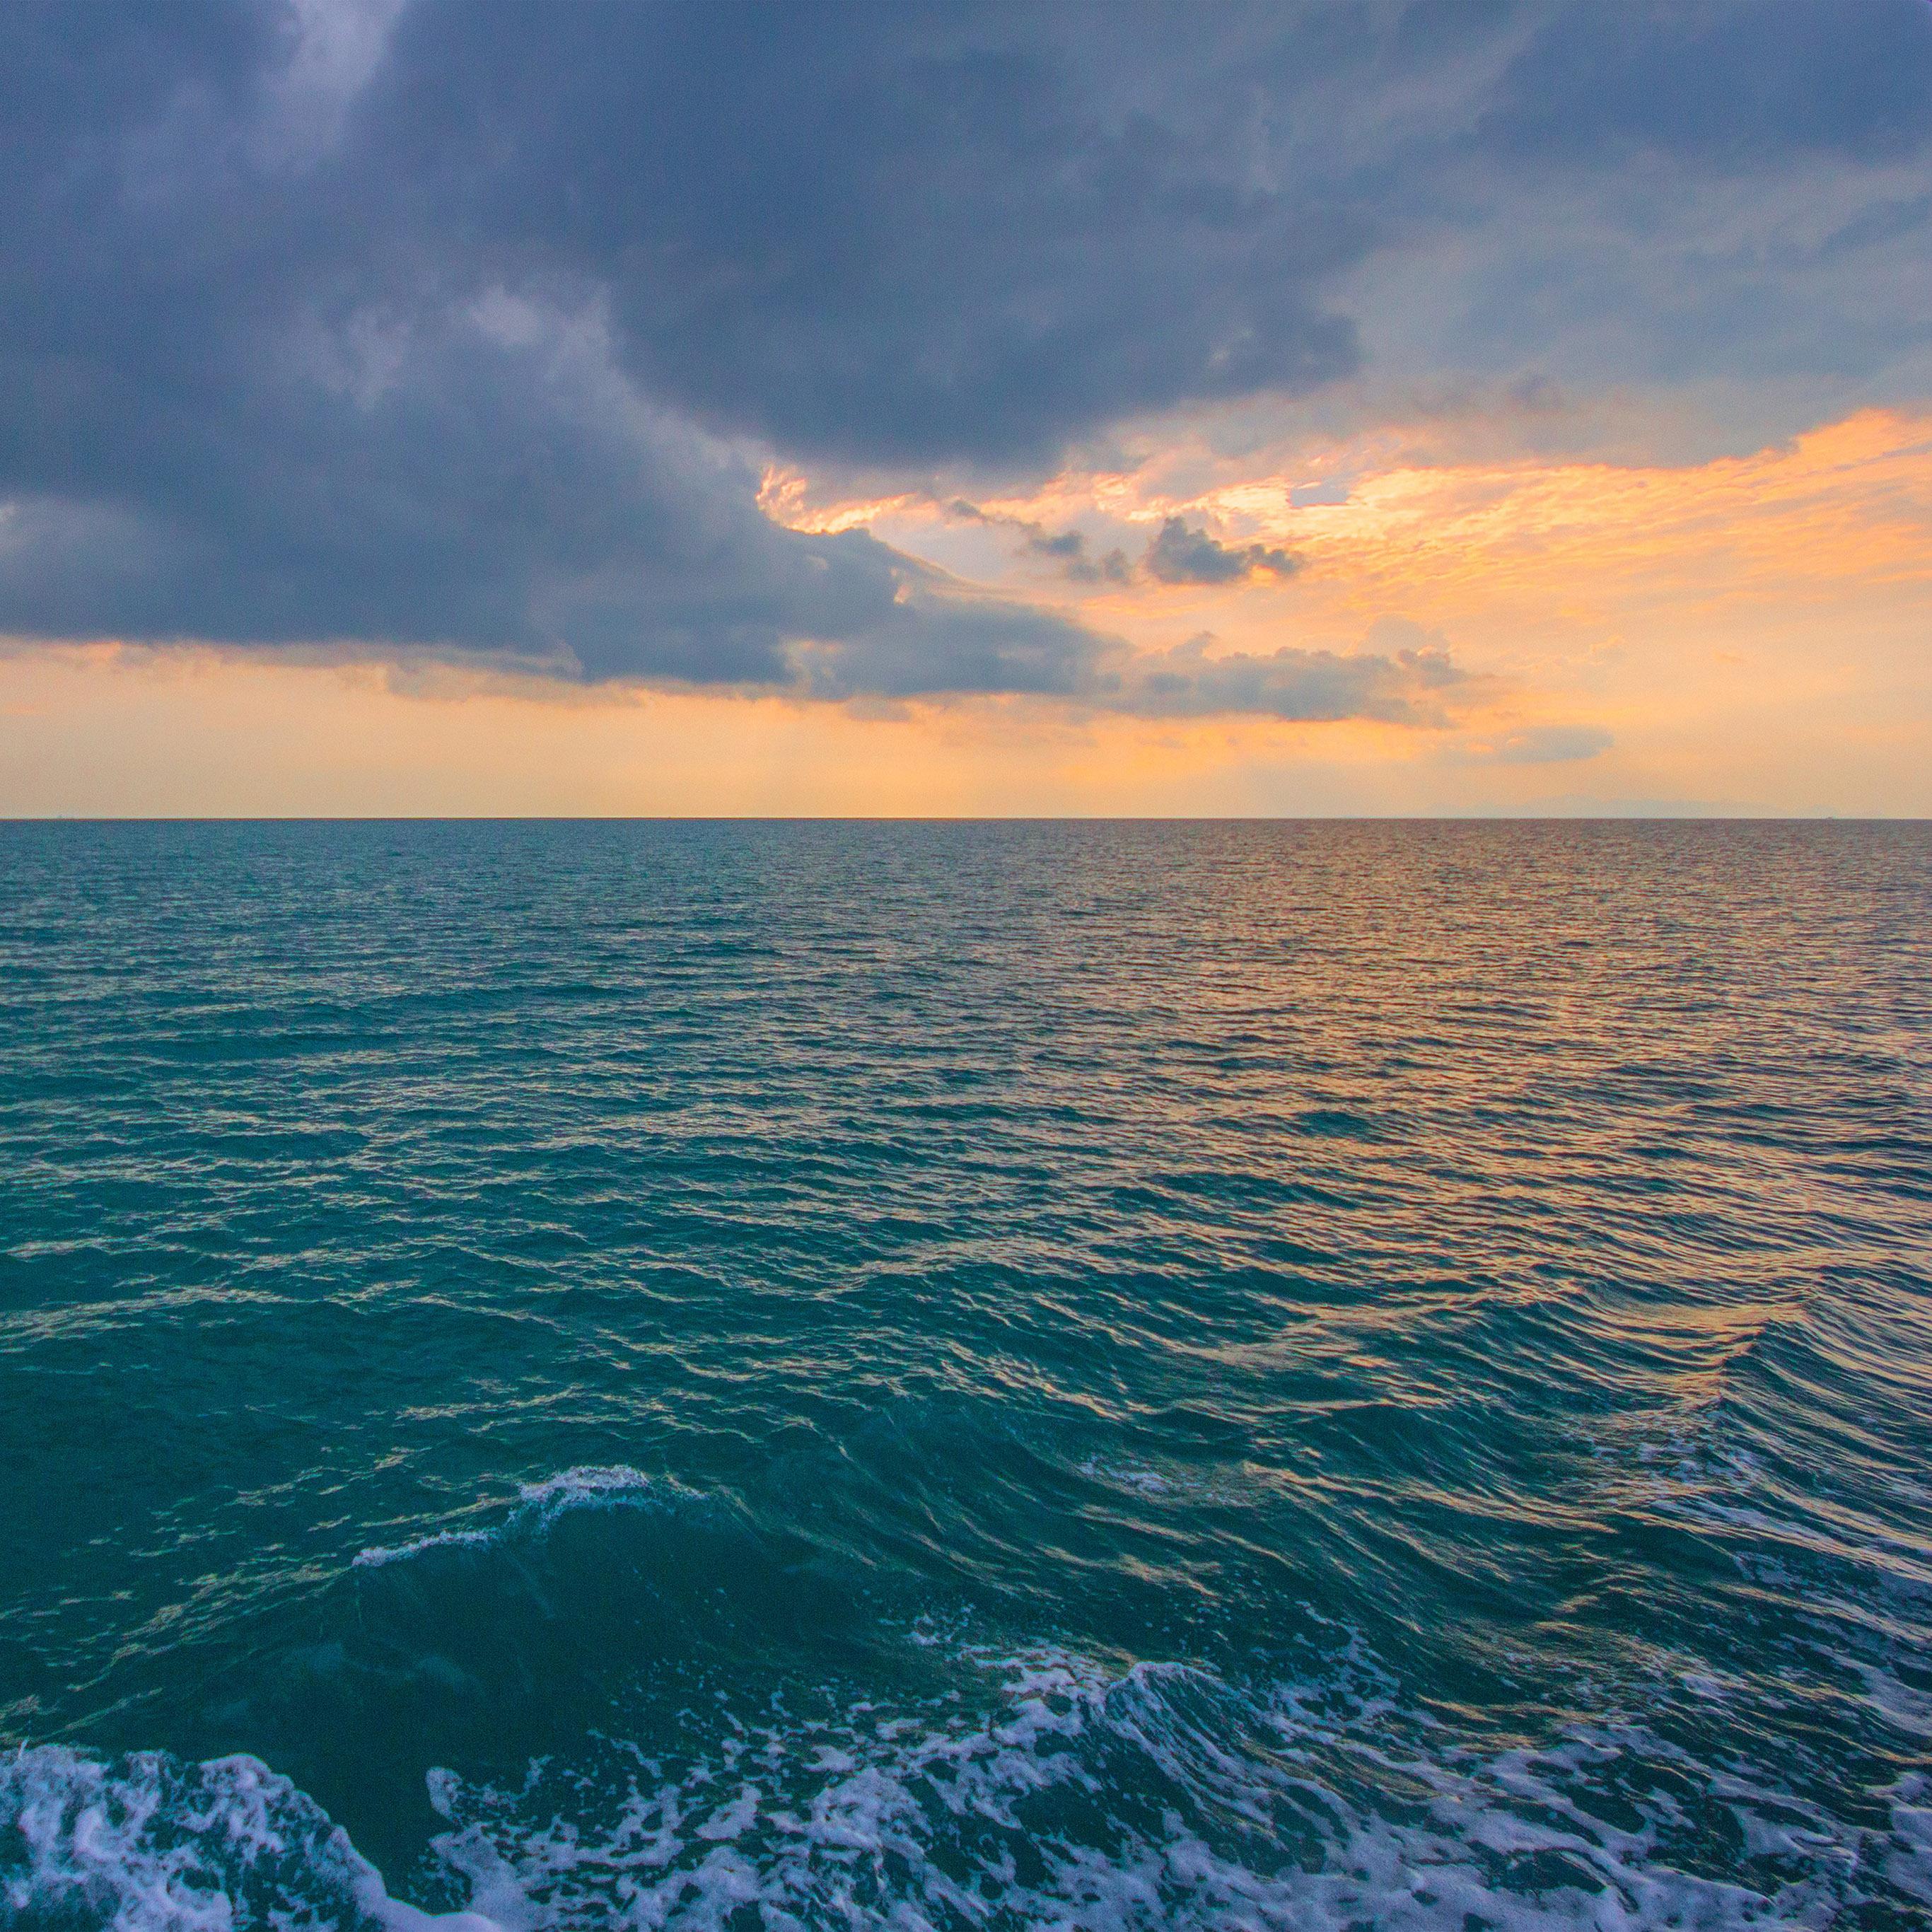 Hd Ocean Wallpaper: Nx09-sunny-sea-sunset-ocean-water-nature-wallpaper